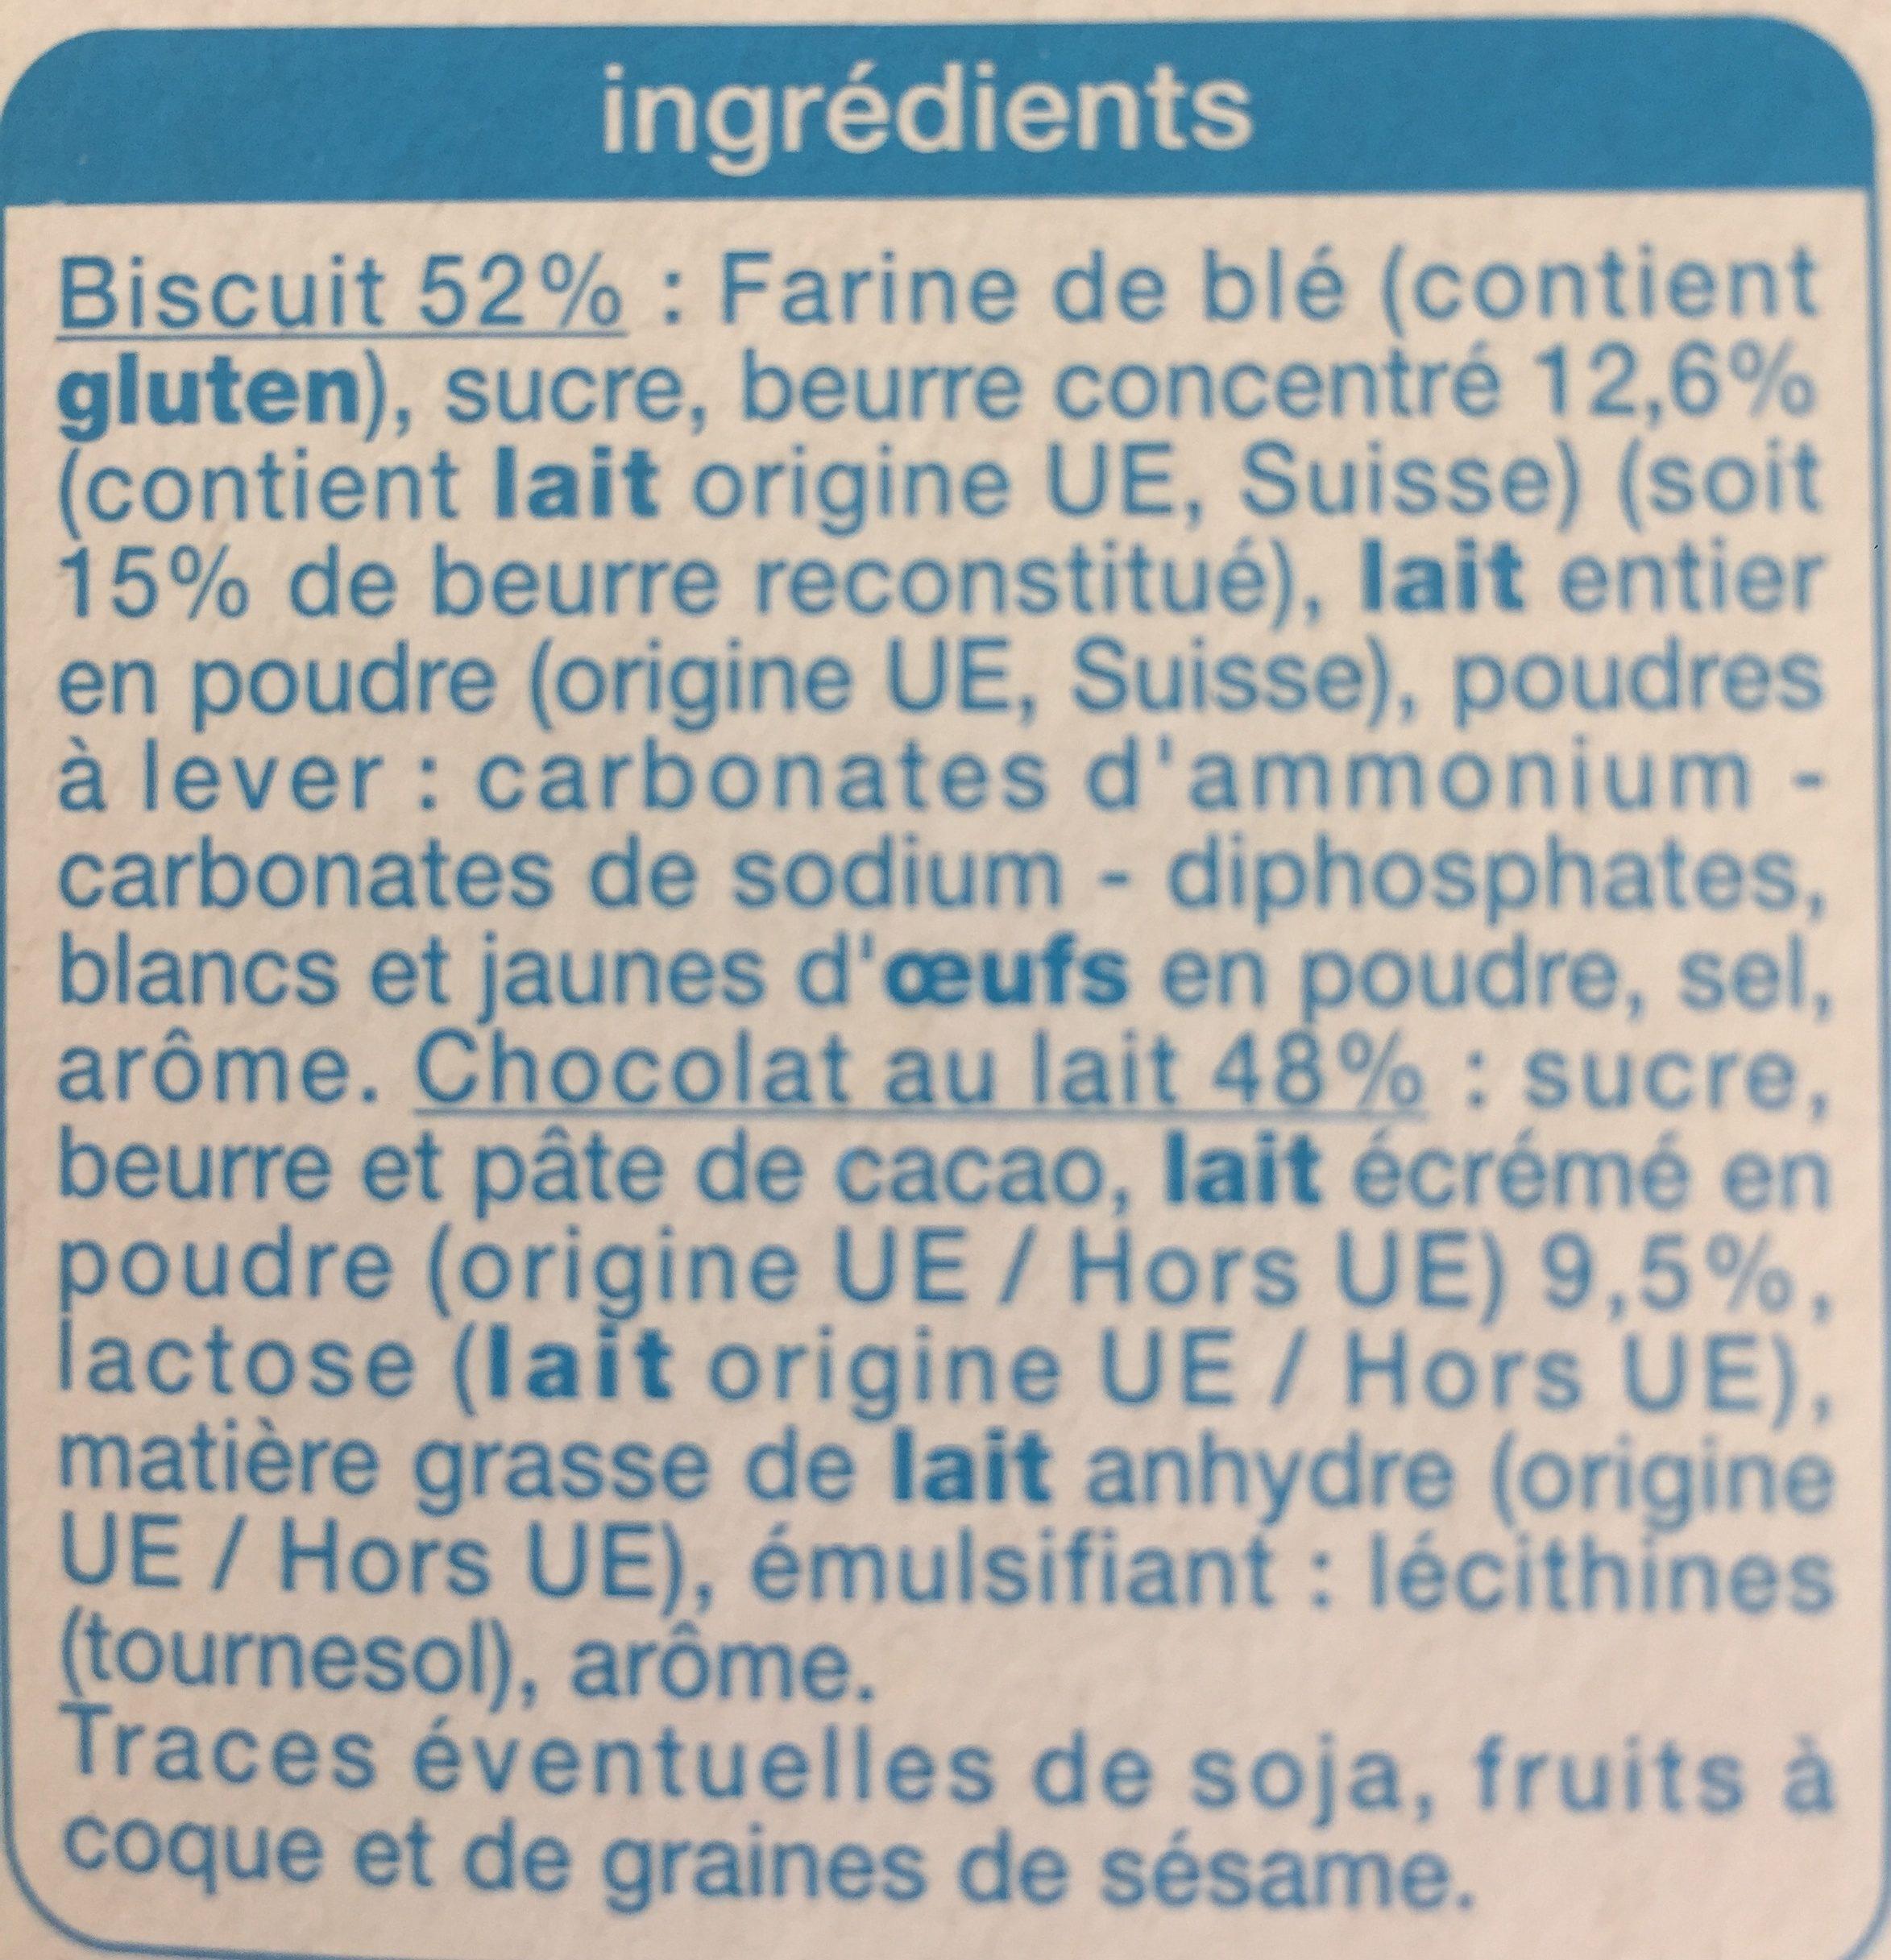 Petit beurre tablette pocket - Ingrédients - fr